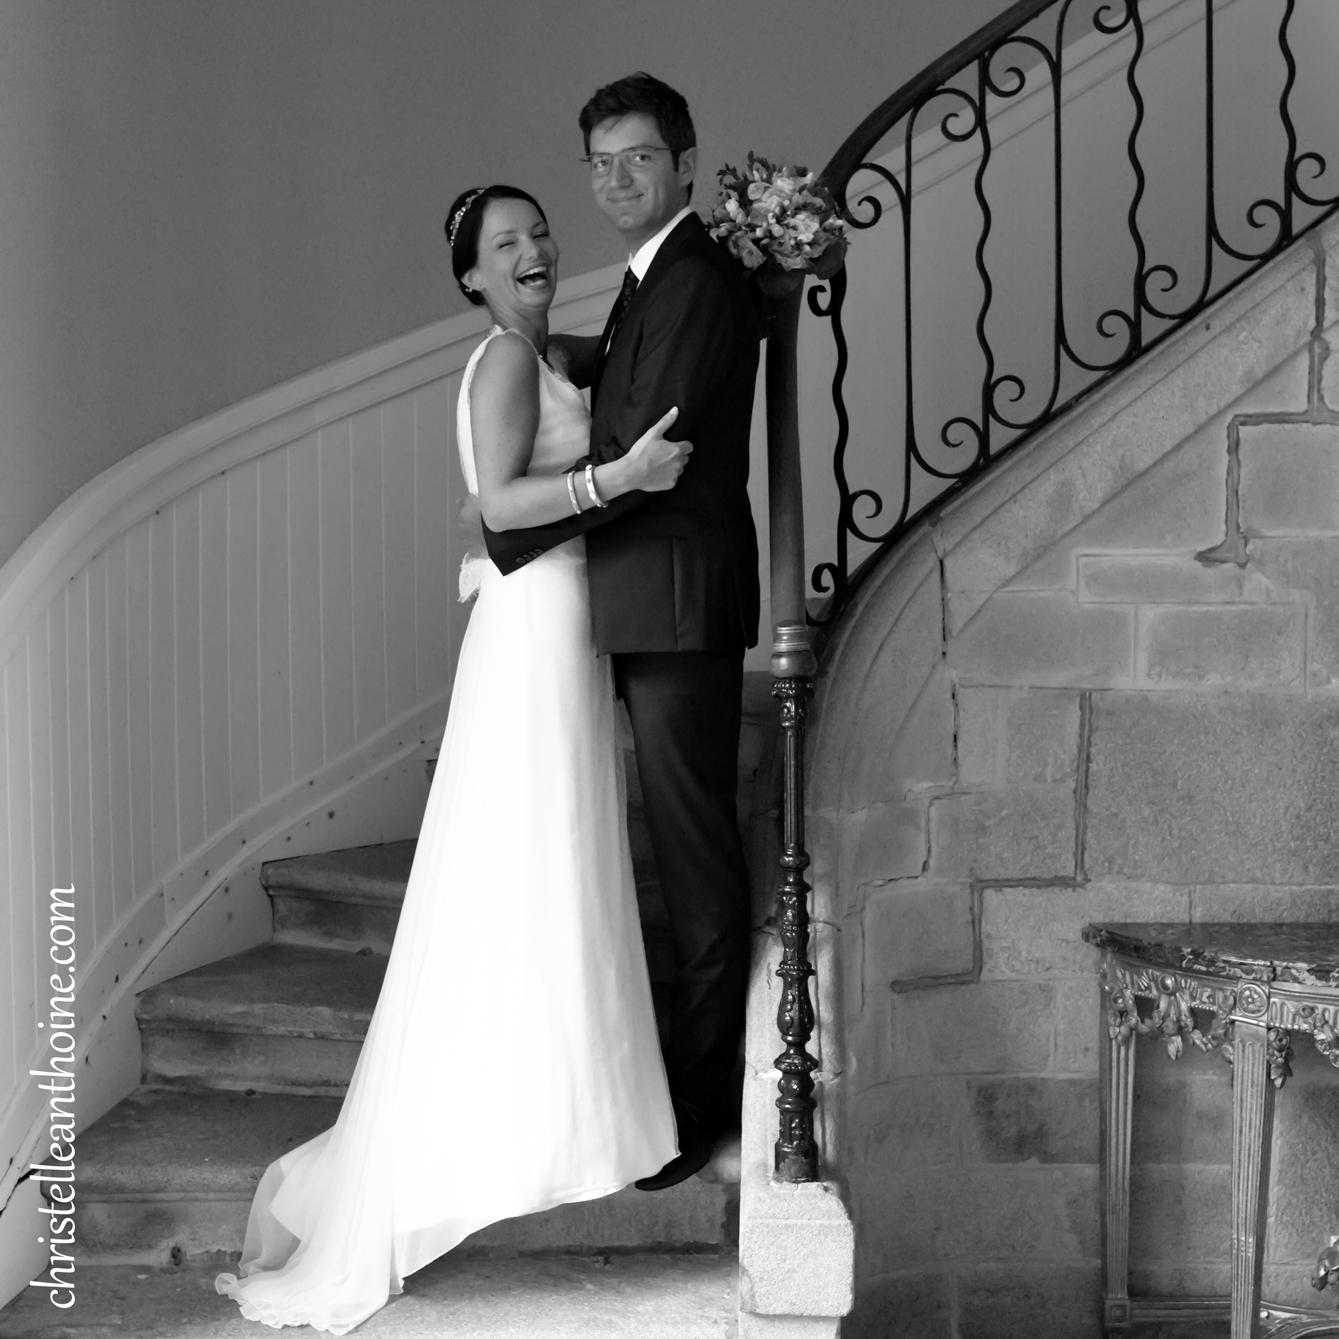 mariage manoir de kerouzien plomelin finistere photographe bretagne christelle anthoine28 - Photographe Mariage Finistere